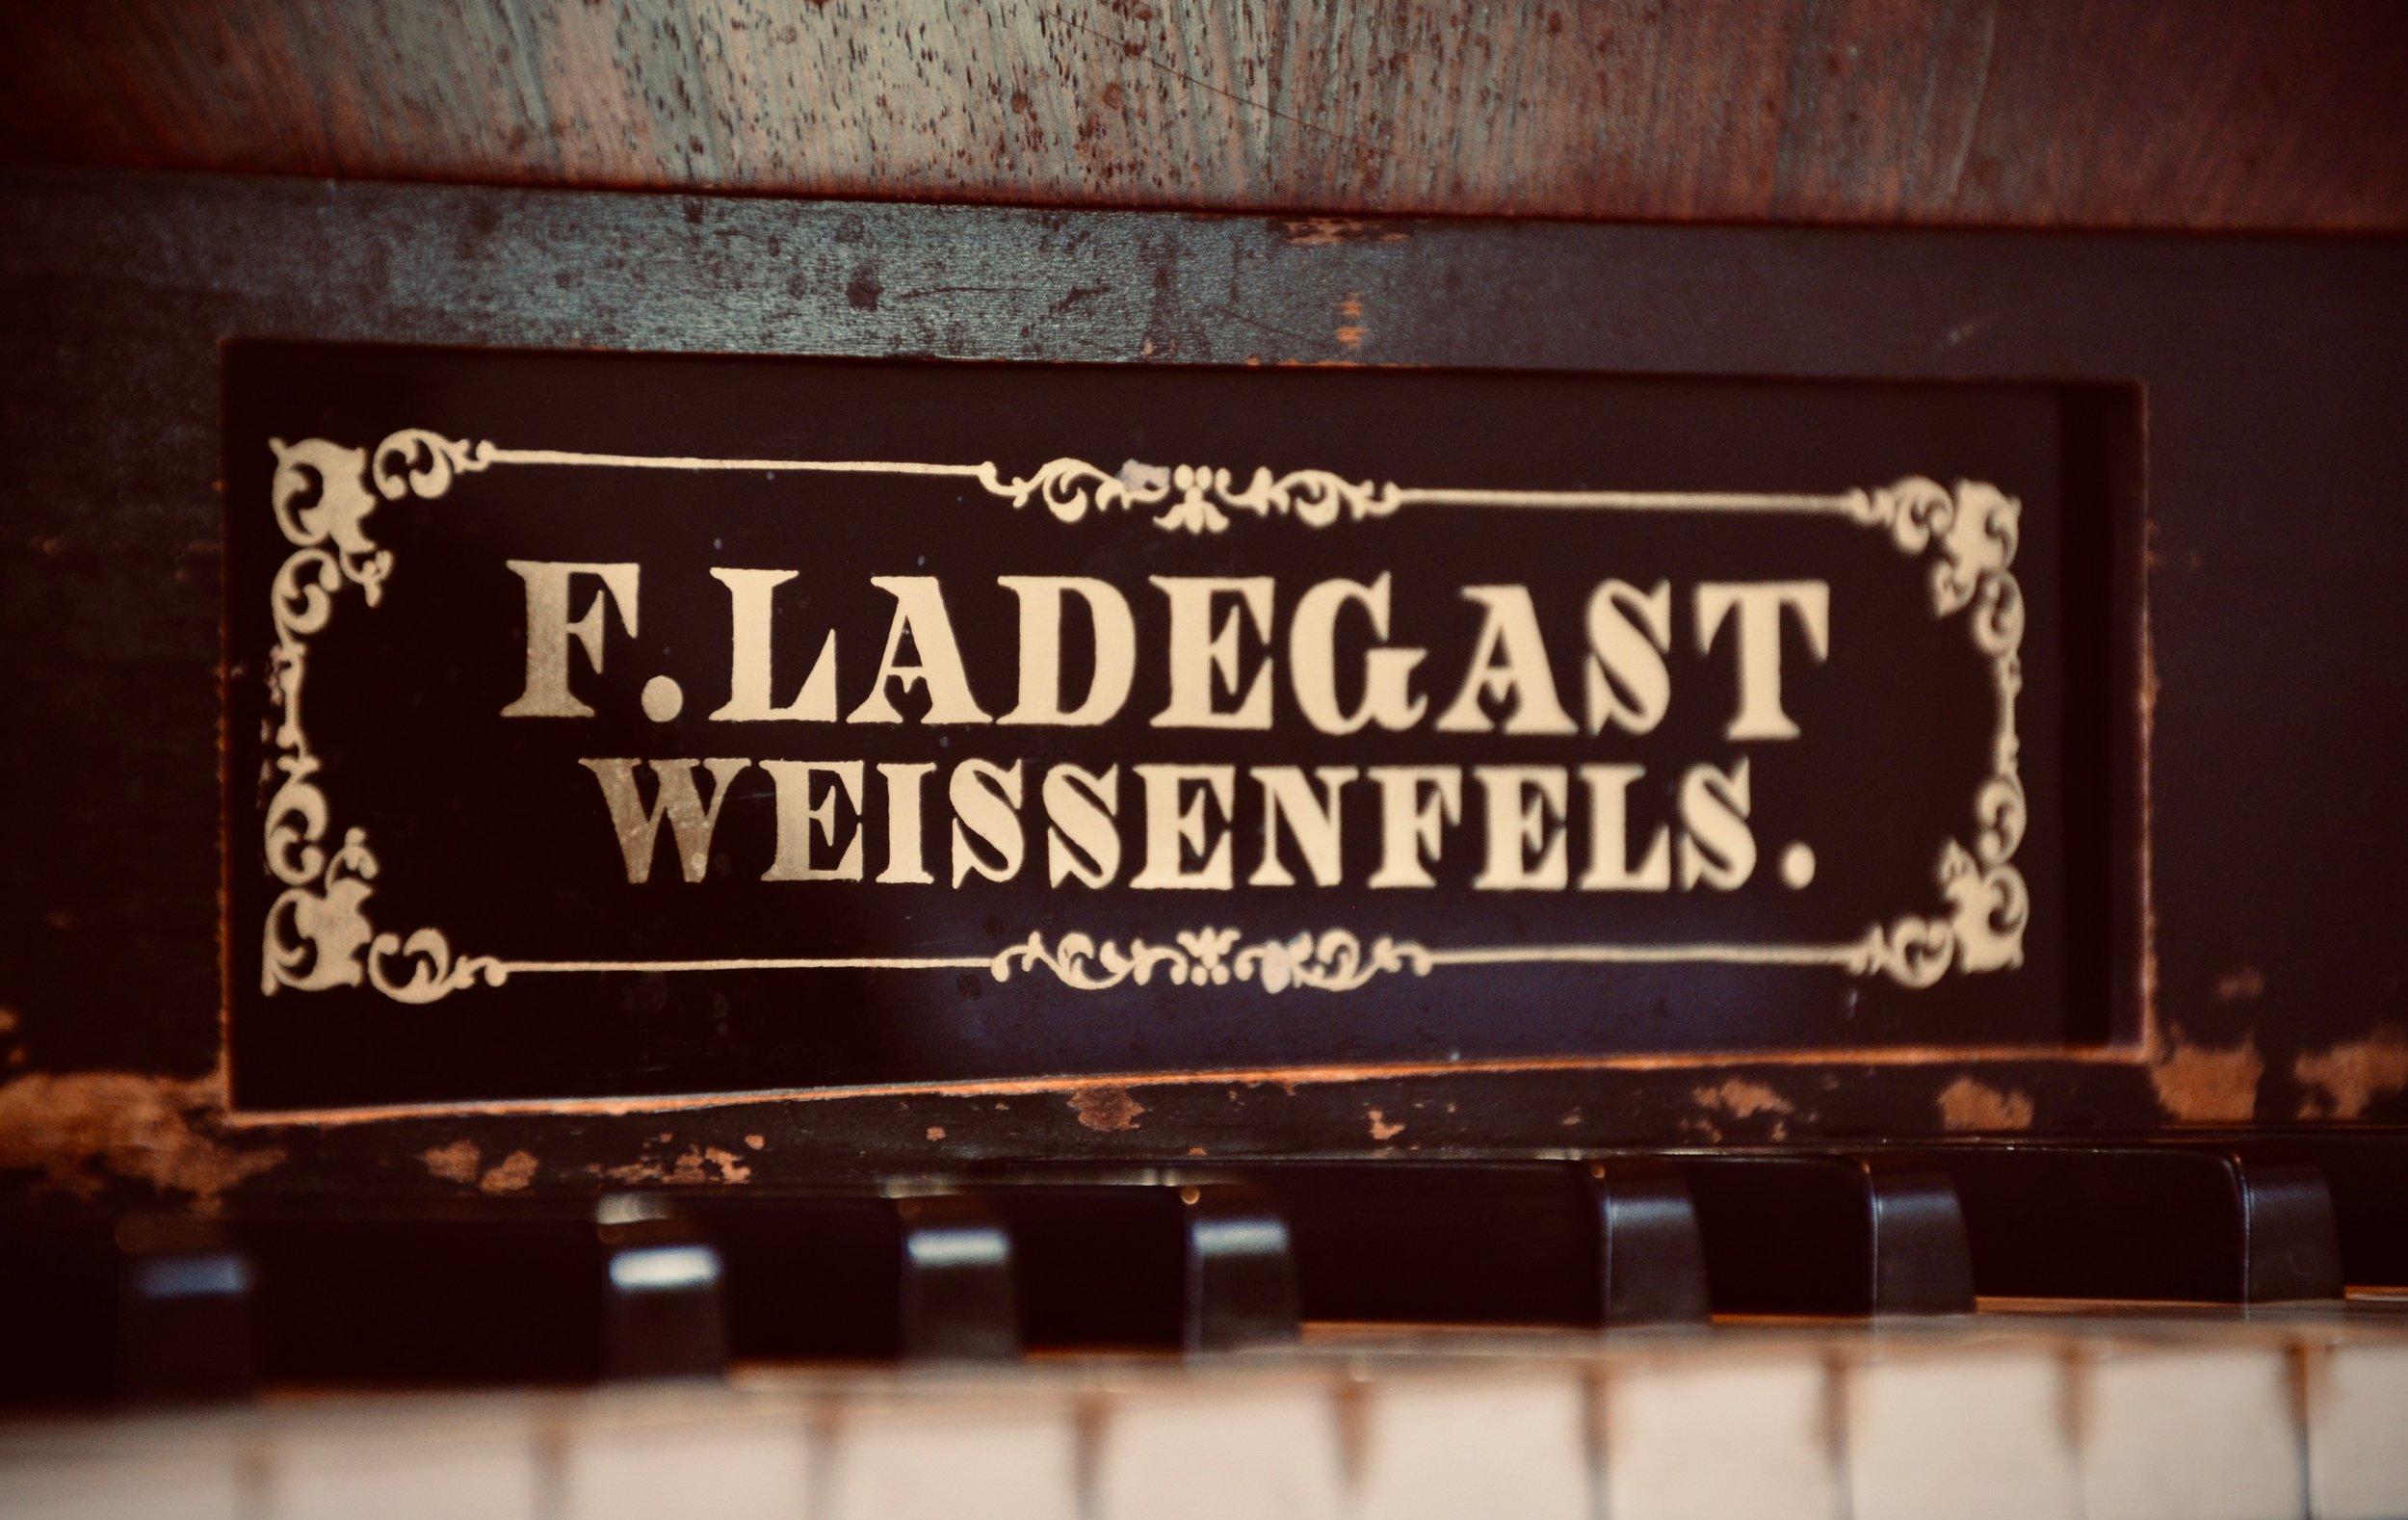 Nameplate, 1869 Ladegast Organ, Marien-Magdalenen-Kirche, Naumburg.